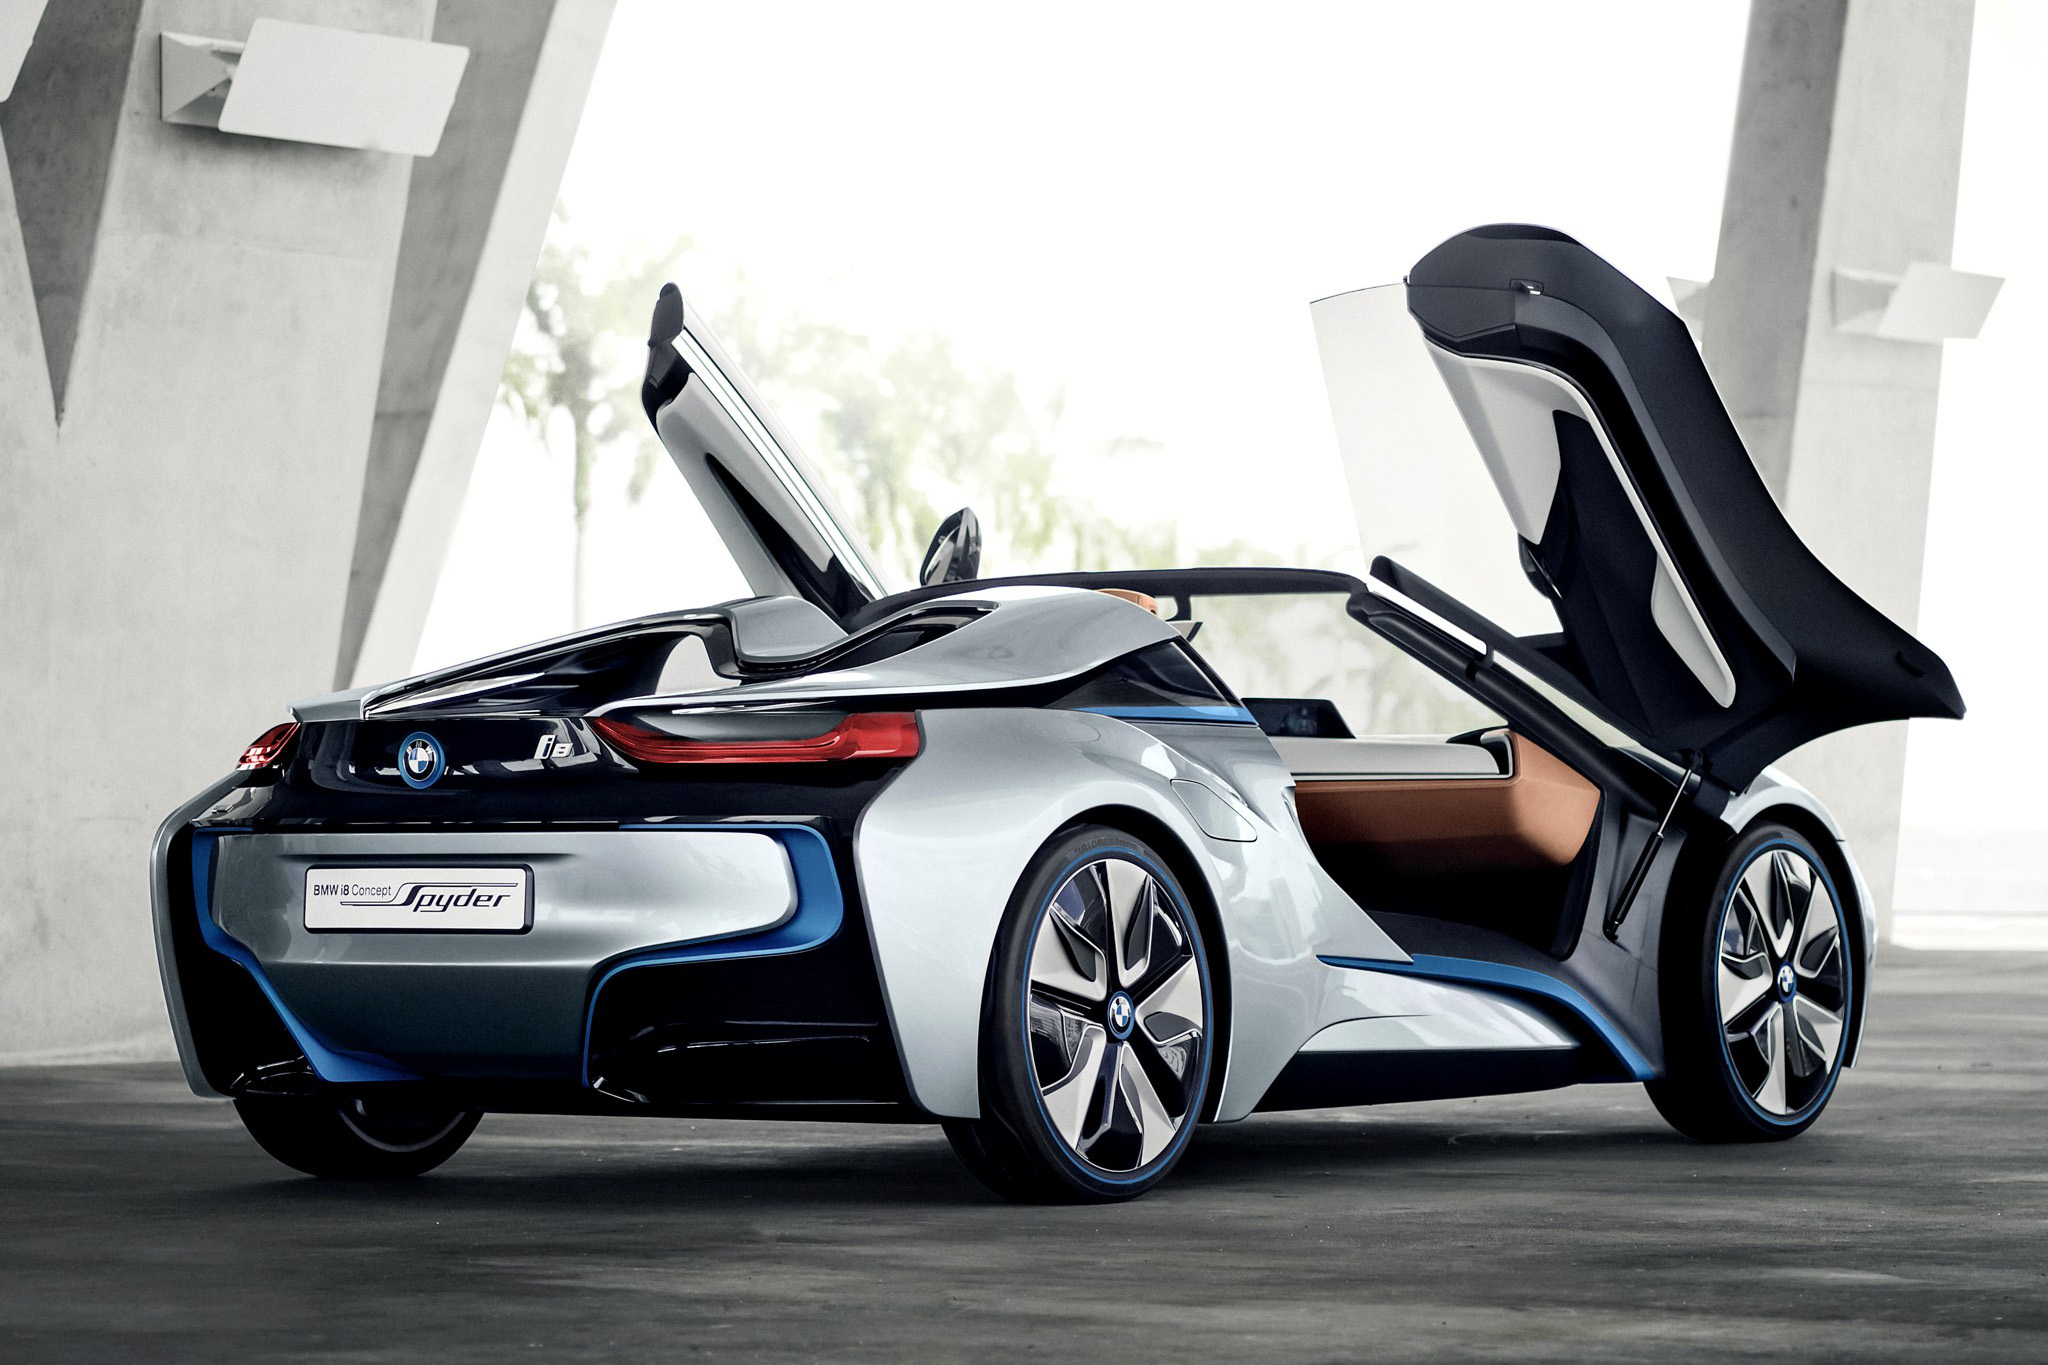 BMW i8 Spyder BMW i8 Spyder BMW i8 Spyder BMW i8 Spyder BMW i8 Spyder BMW i8 Spyder